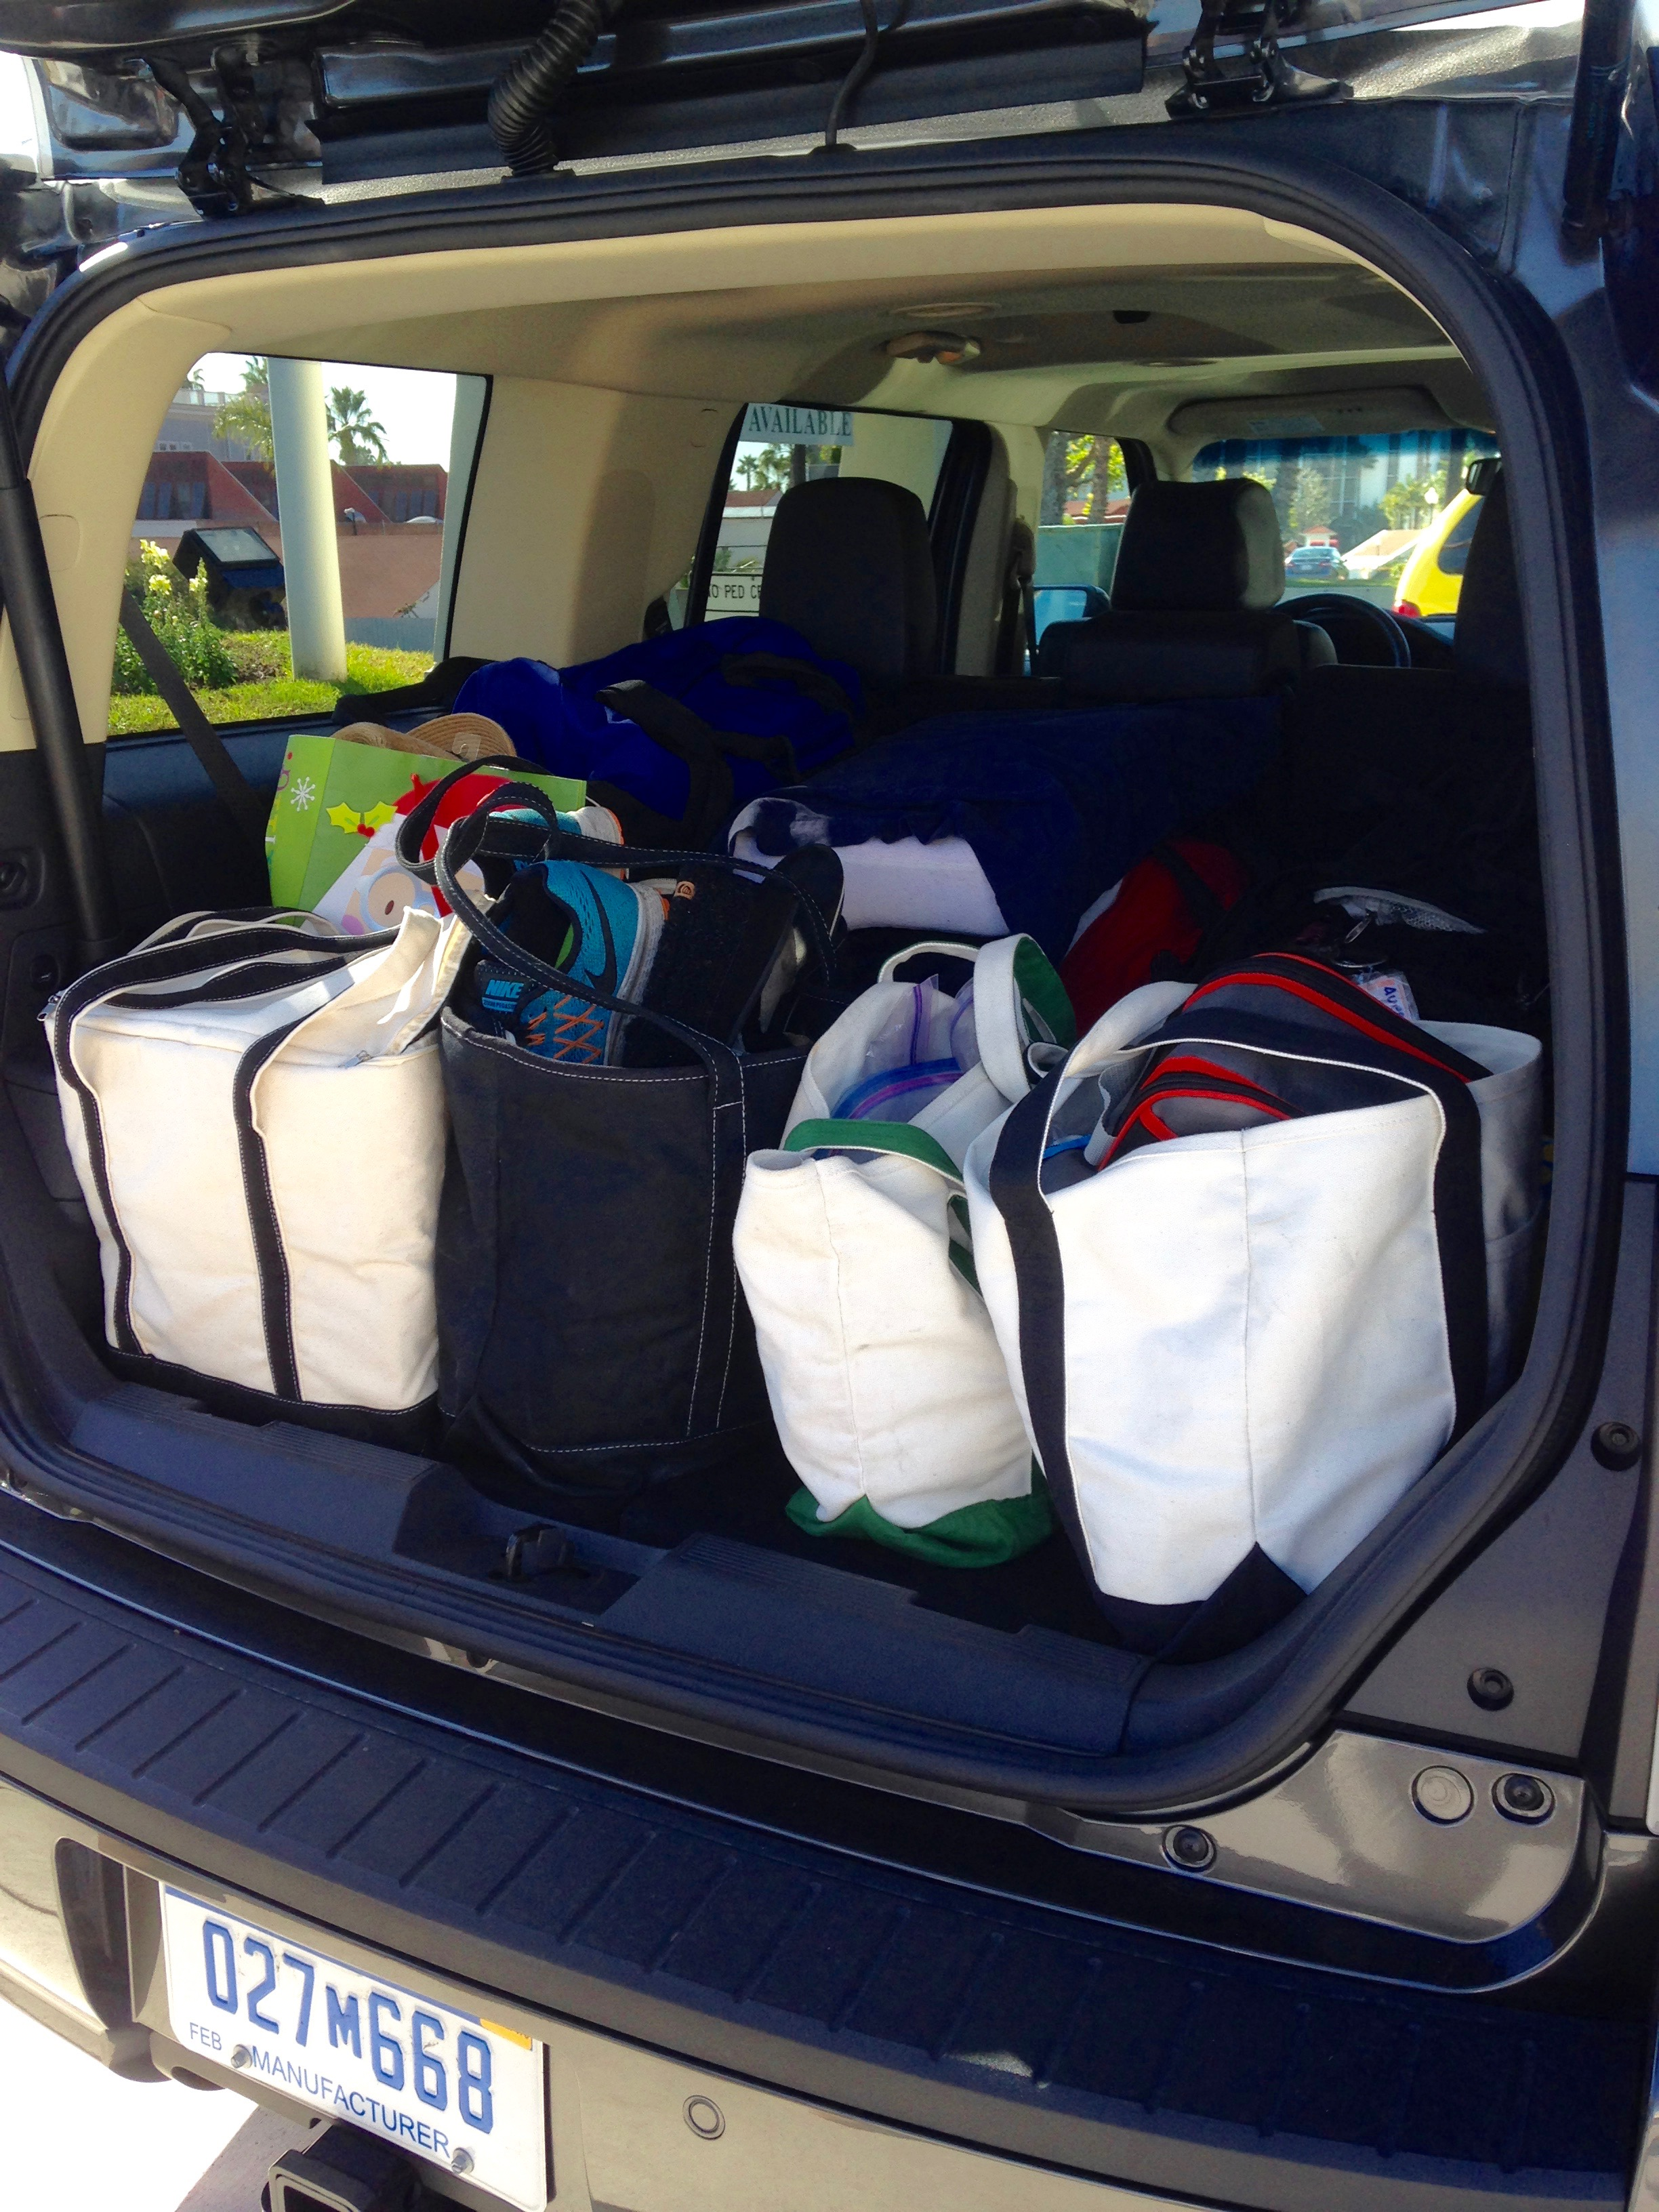 Ford Flex trunk full